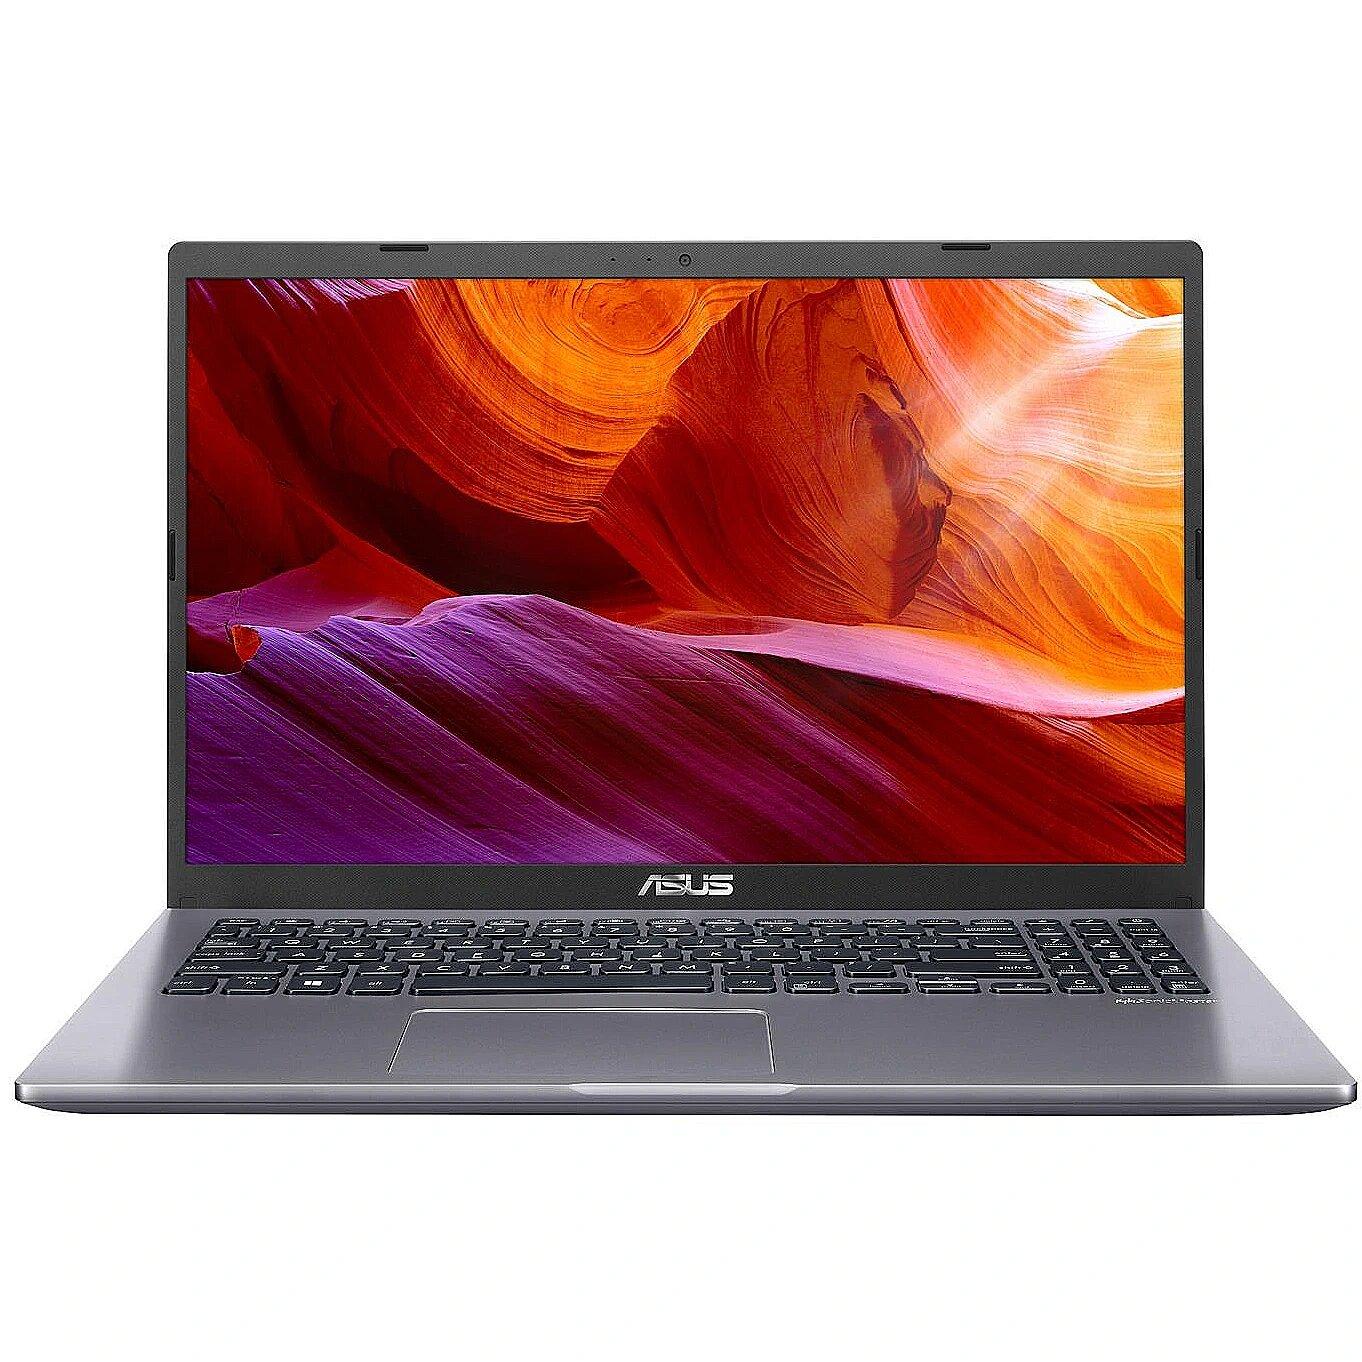 Asus Laptop 15 X509JA-BQ039T Slate Gray, 15.6